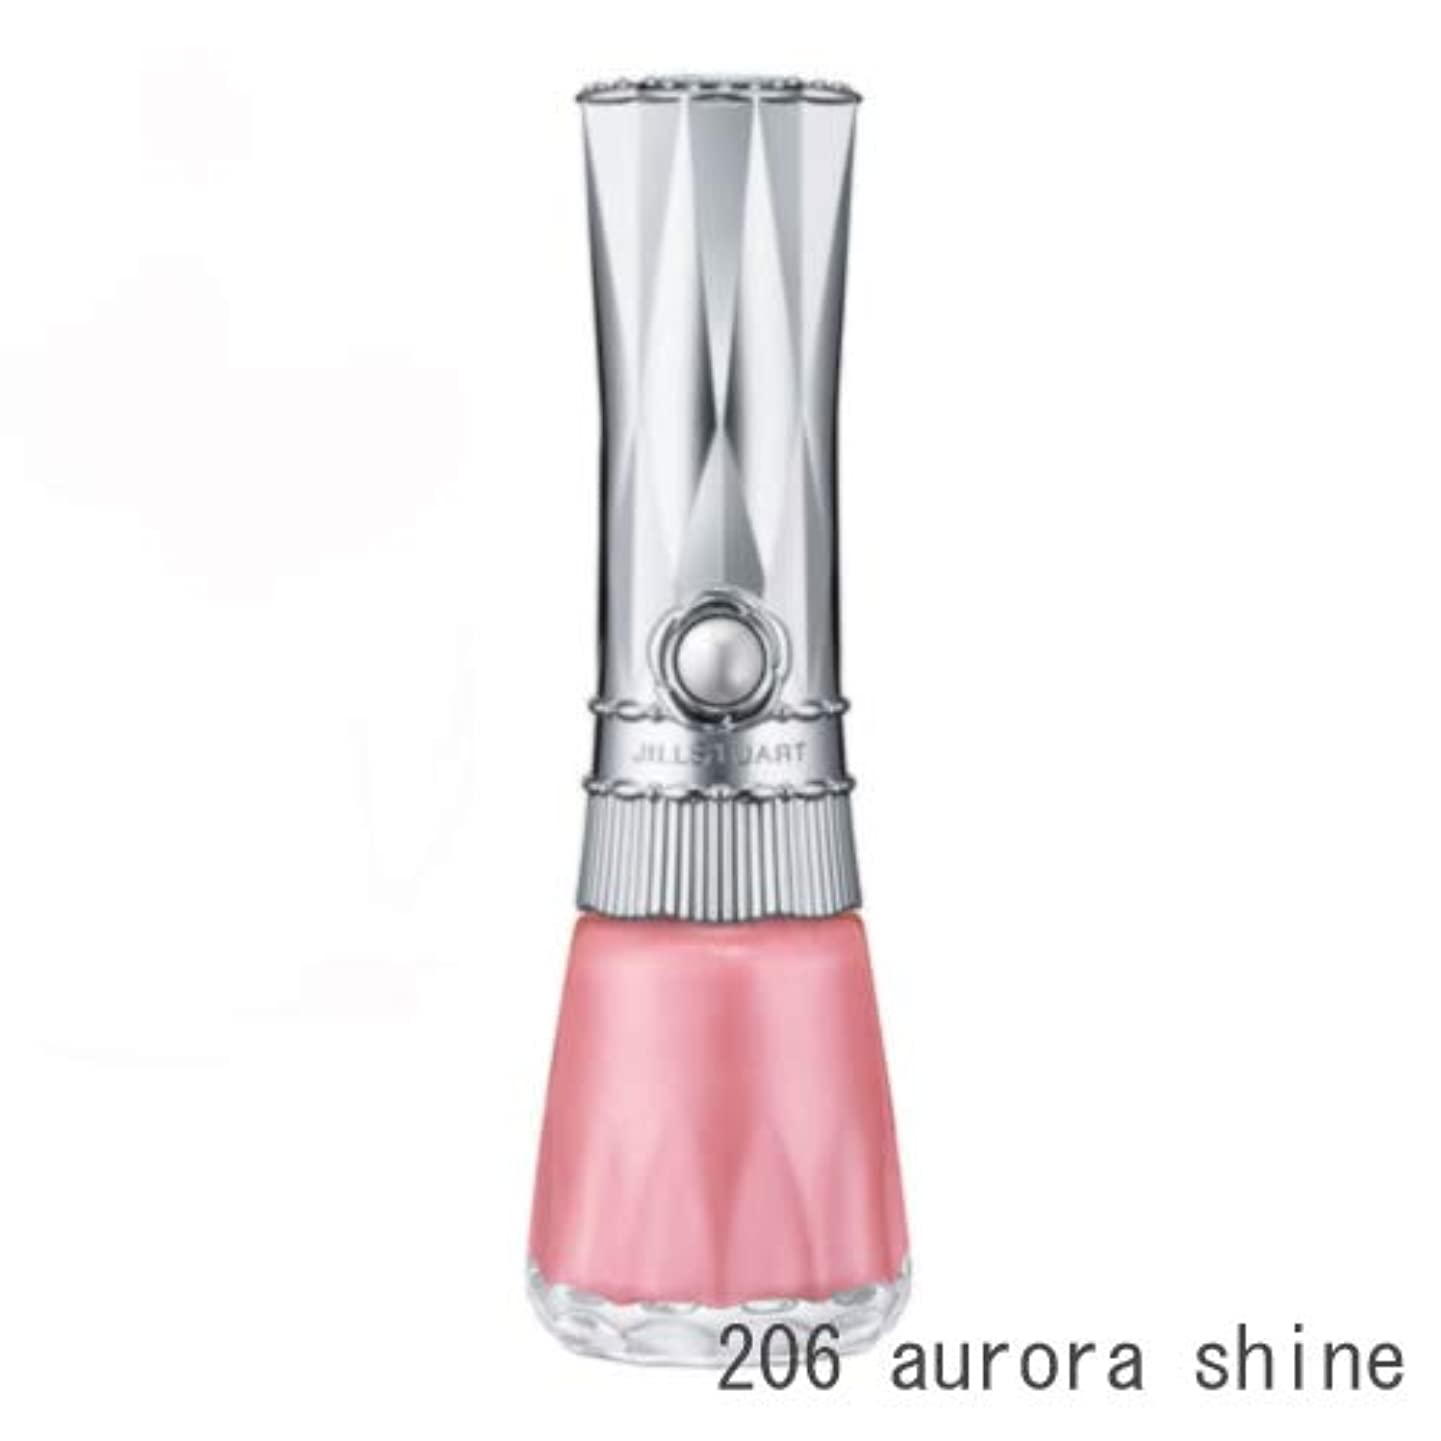 JILLSTUART(ジルスチュアート) ジルスチュアート ネイルラッカー パール 7mL (206 aurora shine【数量限定】)